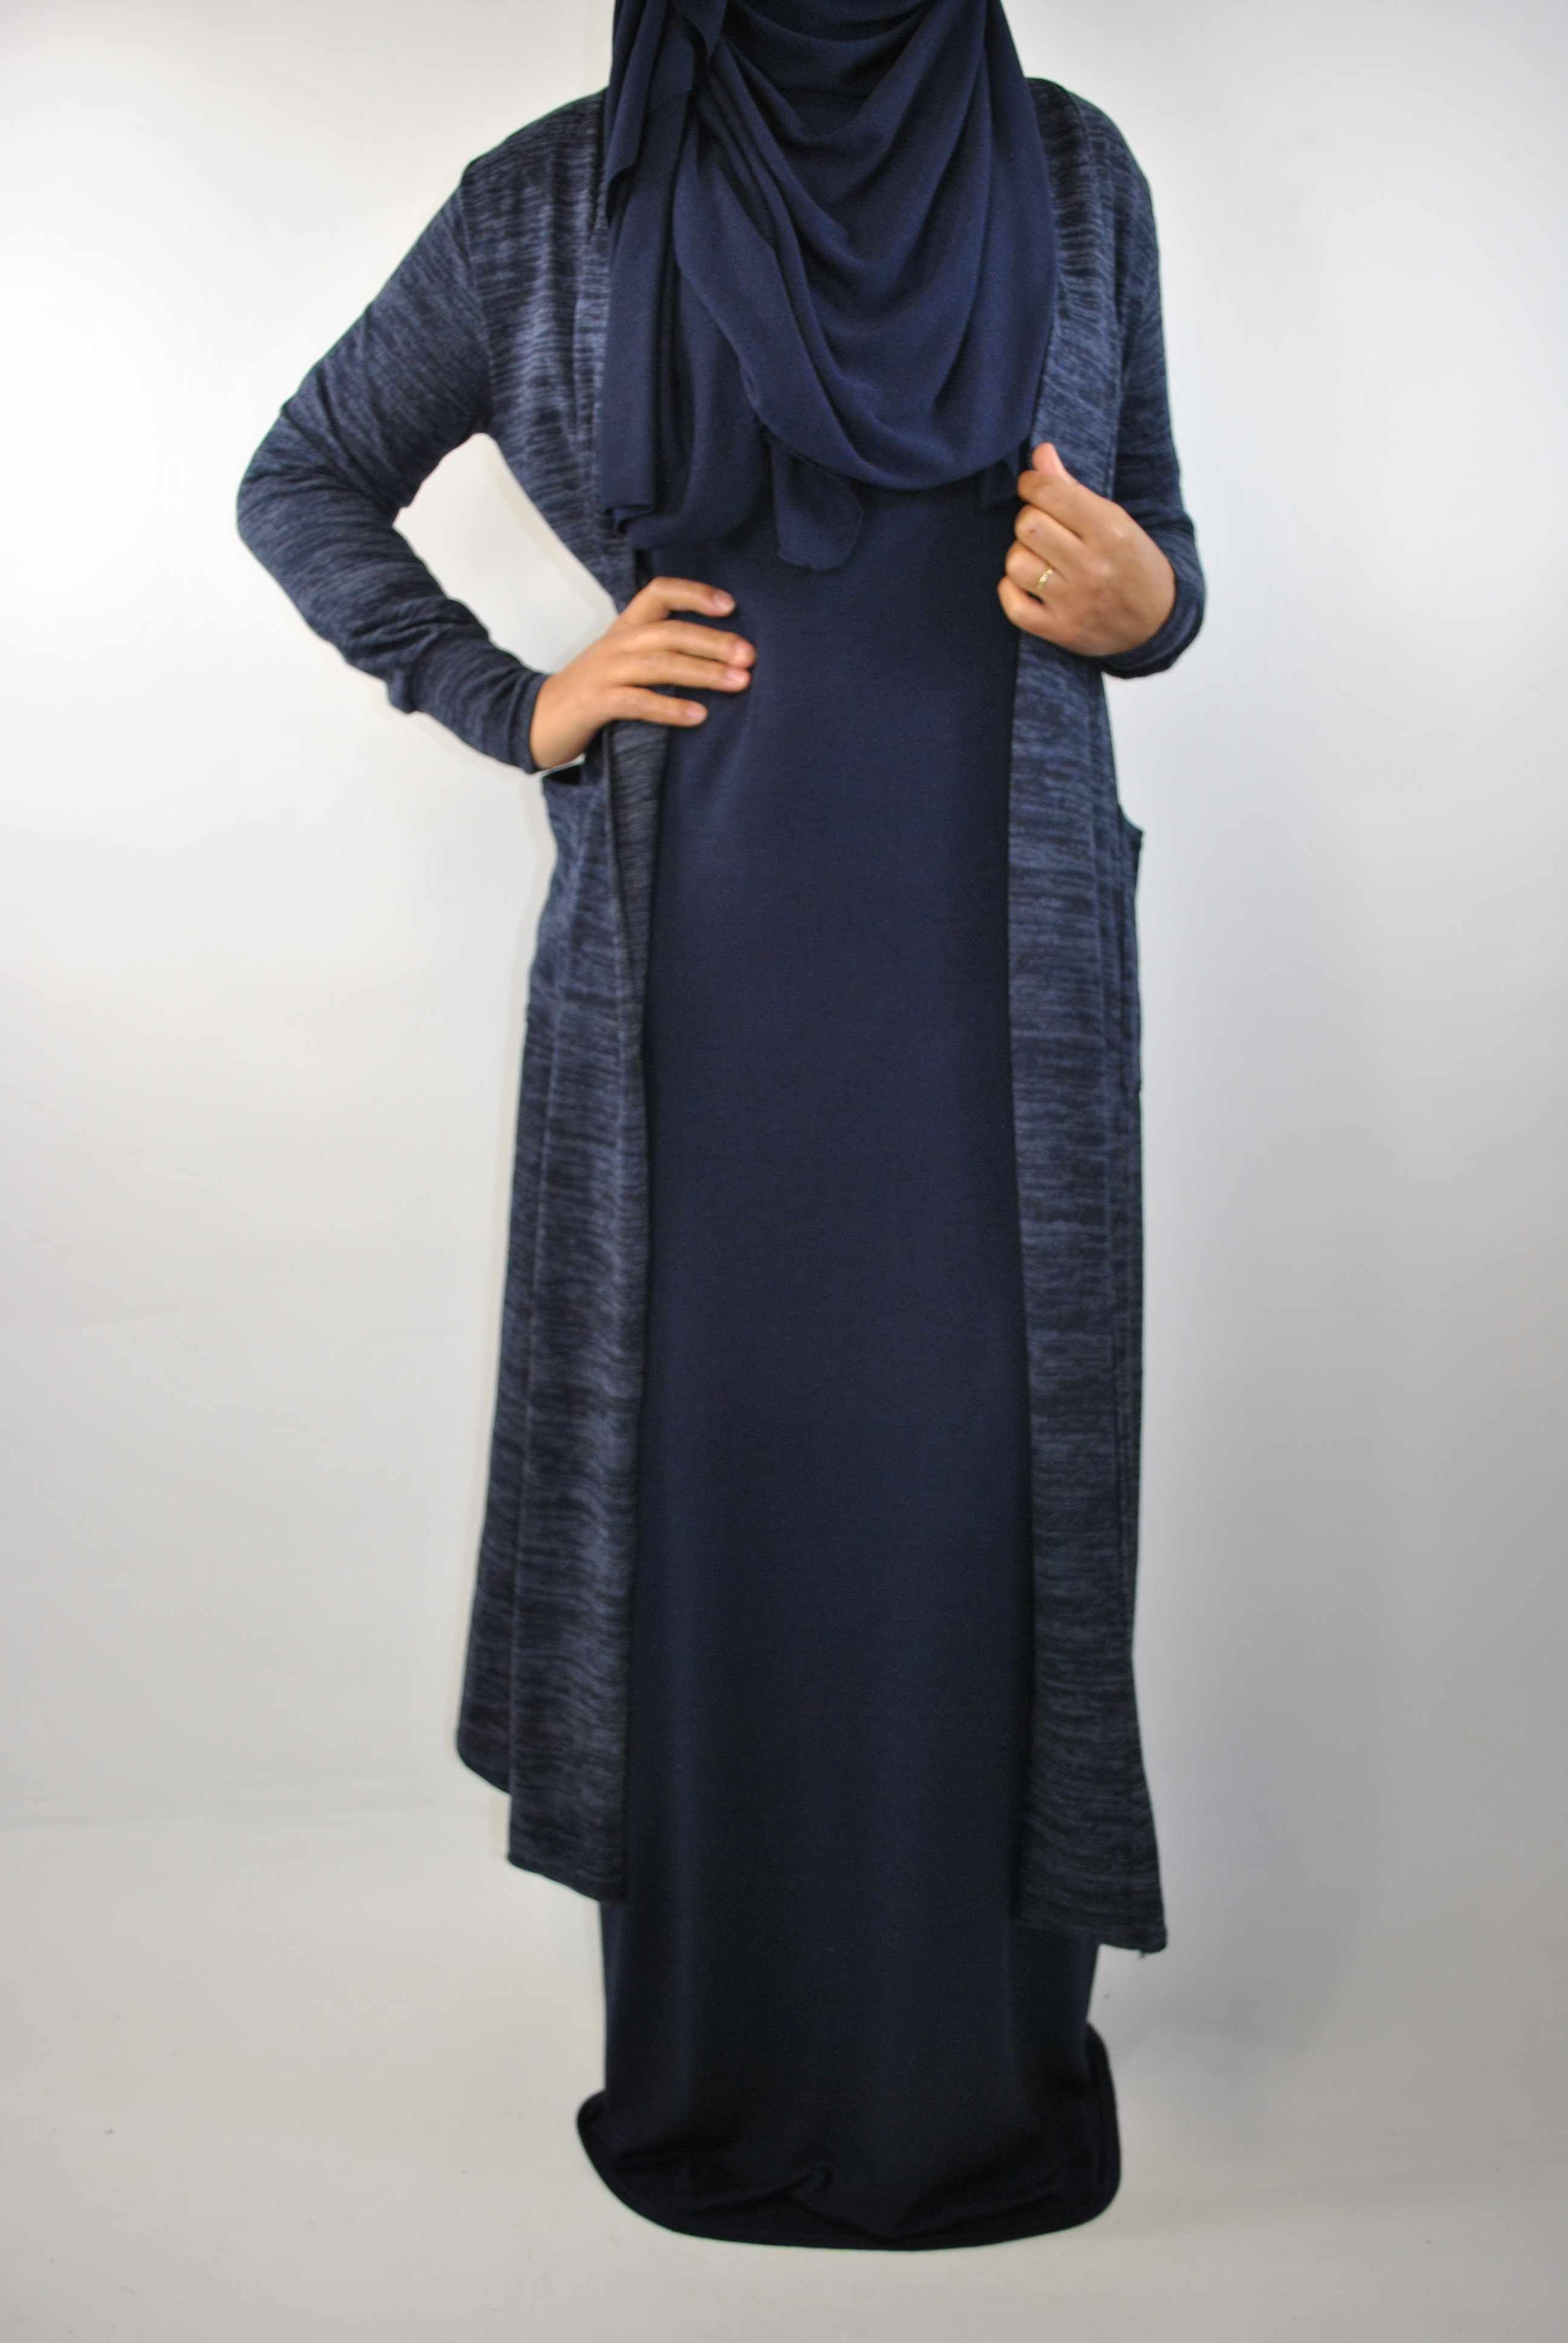 8587a9053c2a Robe longue pas cher pour musulmane   Mode hijab   Pinterest